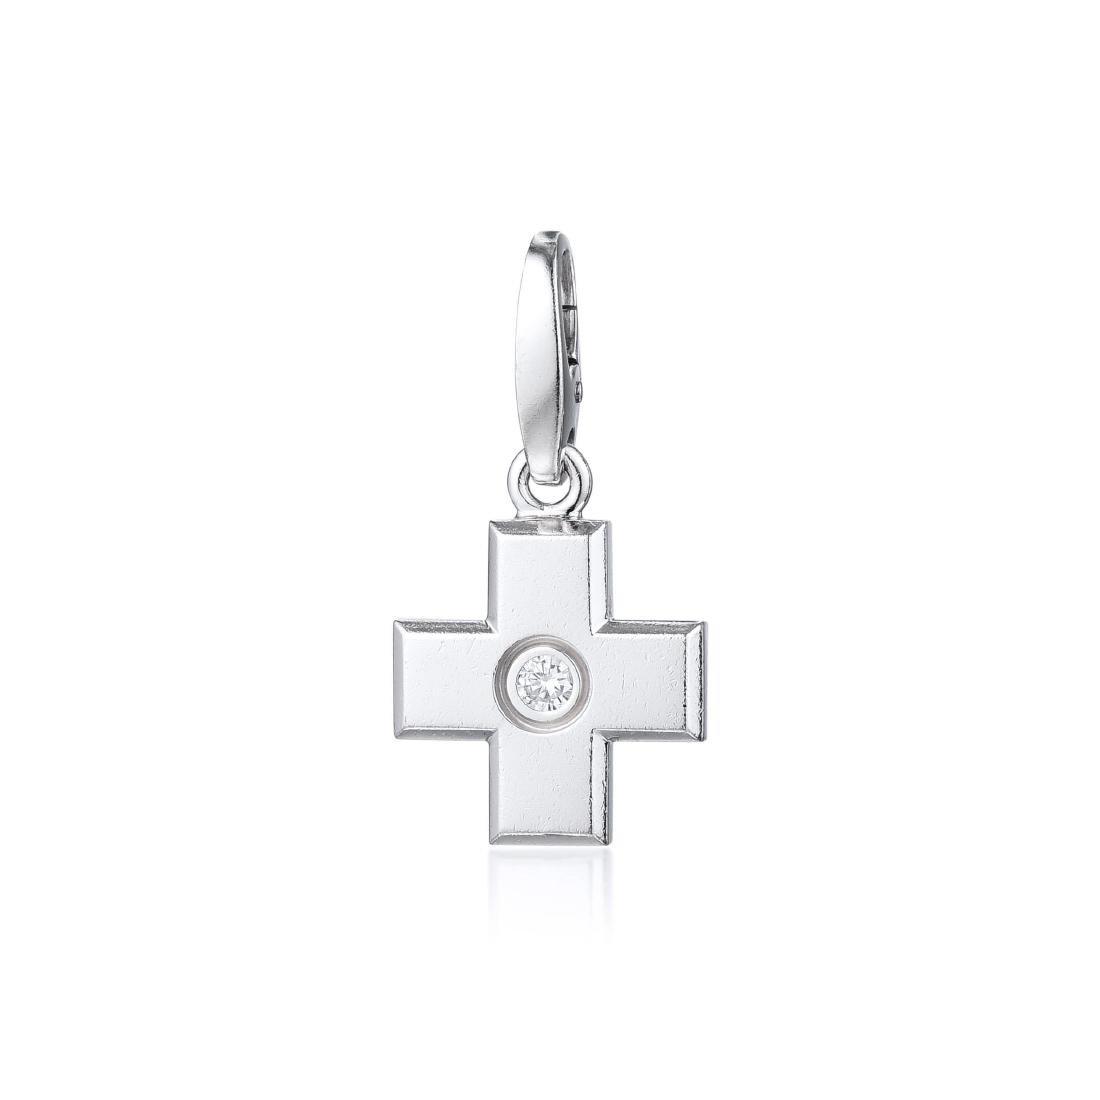 Cartier 18K White Gold and Diamond Cross Pendant